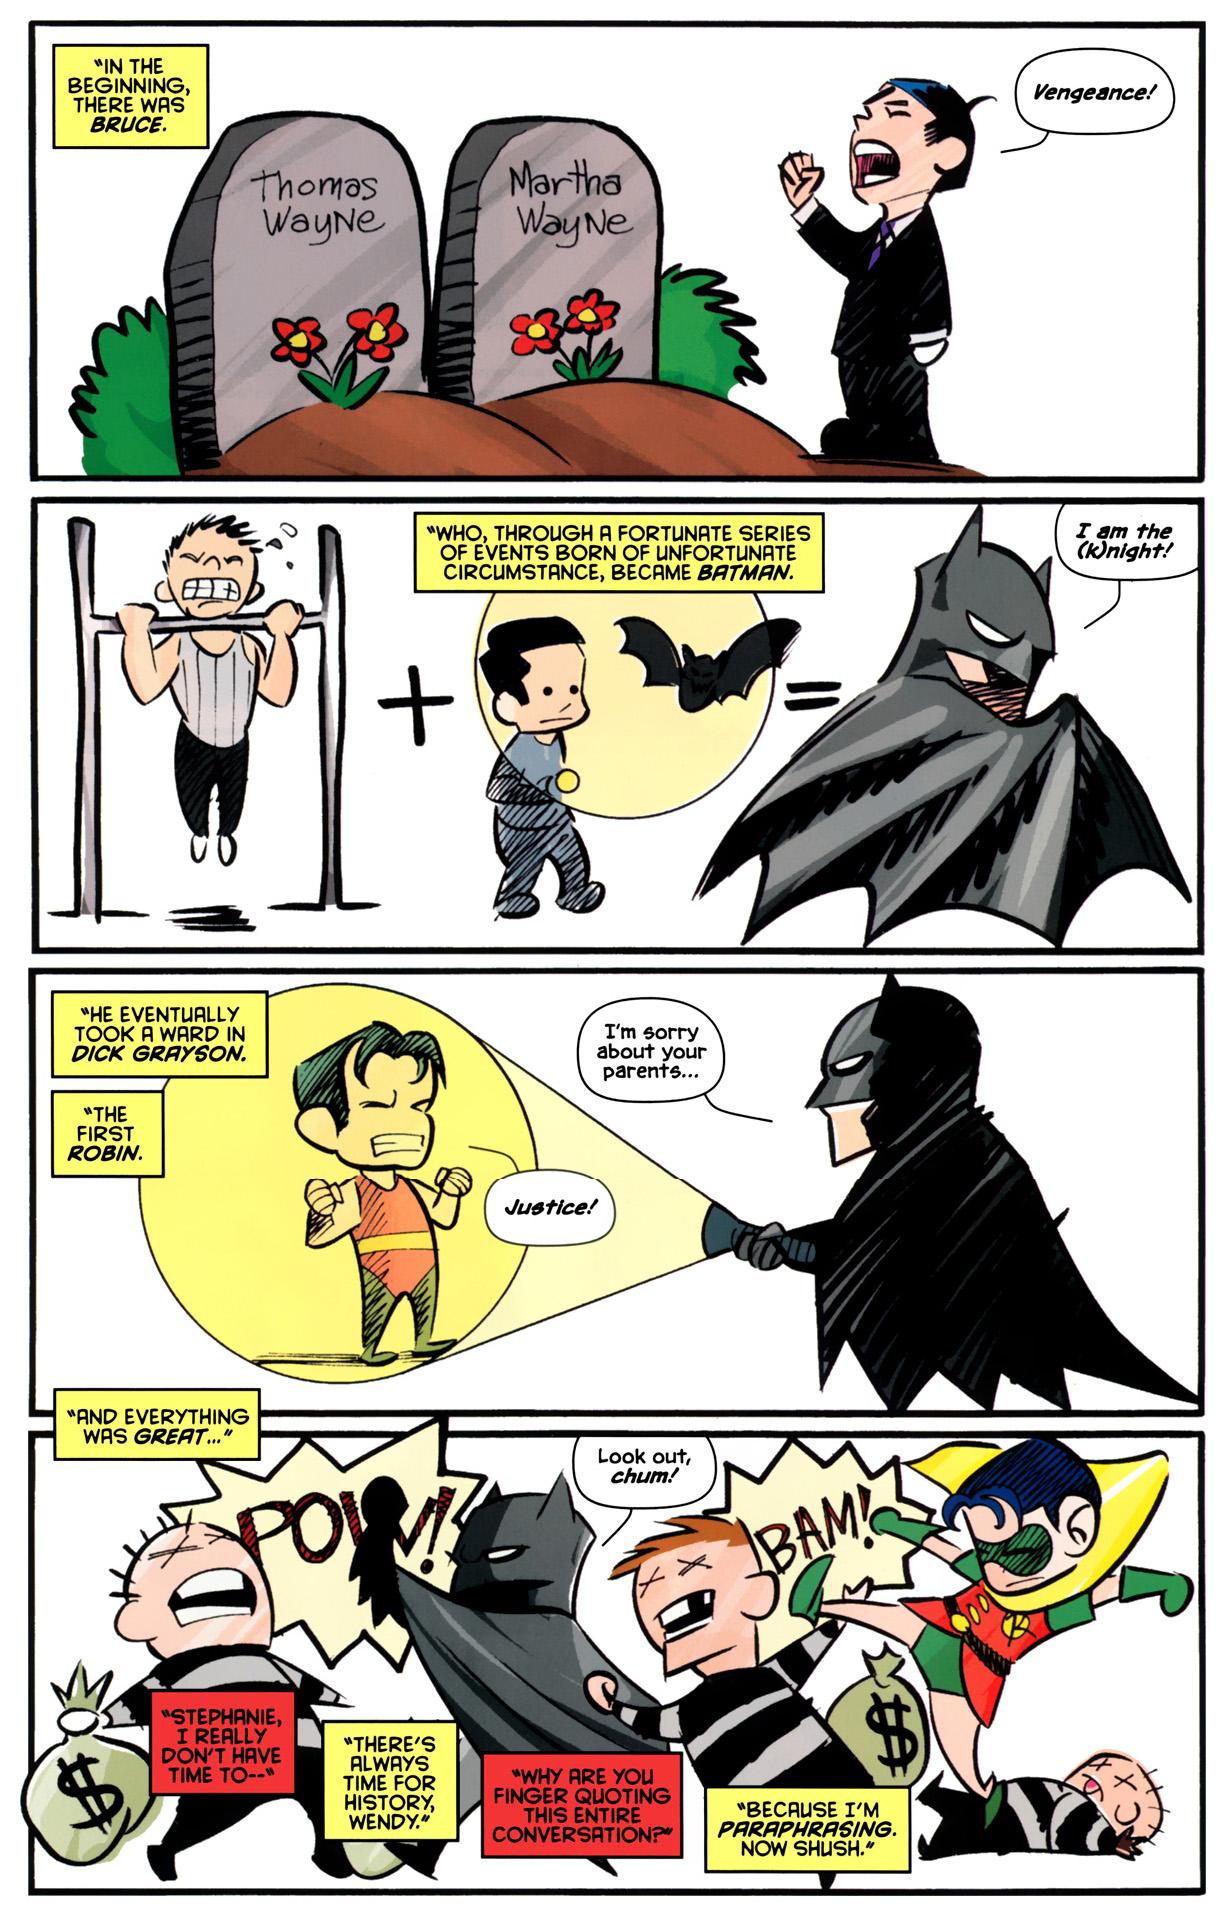 history of the bat family by batgirl